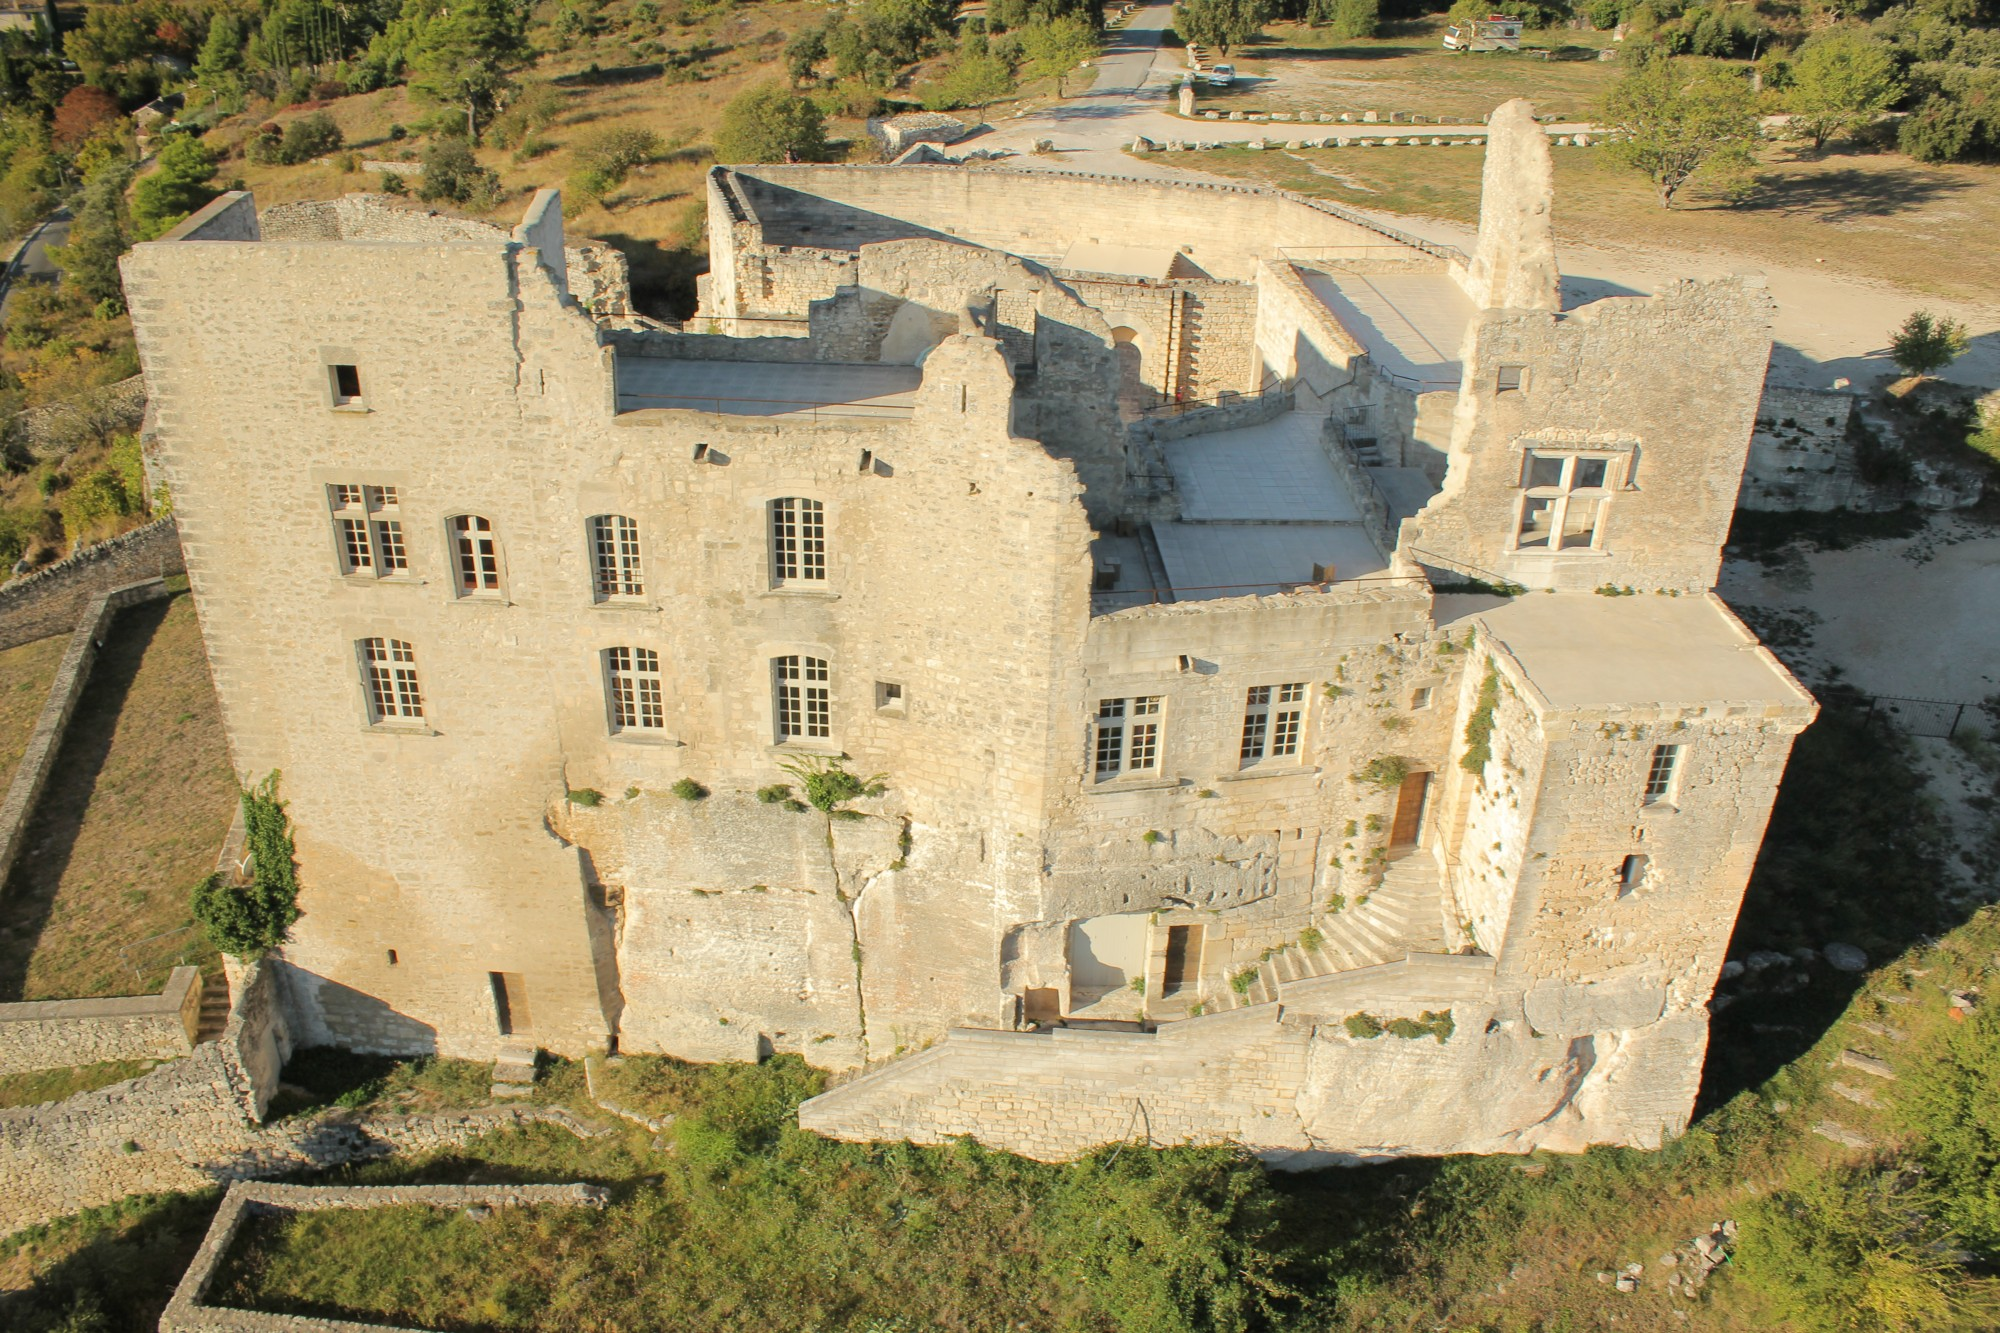 Le chateau de Lacoste, façade principale